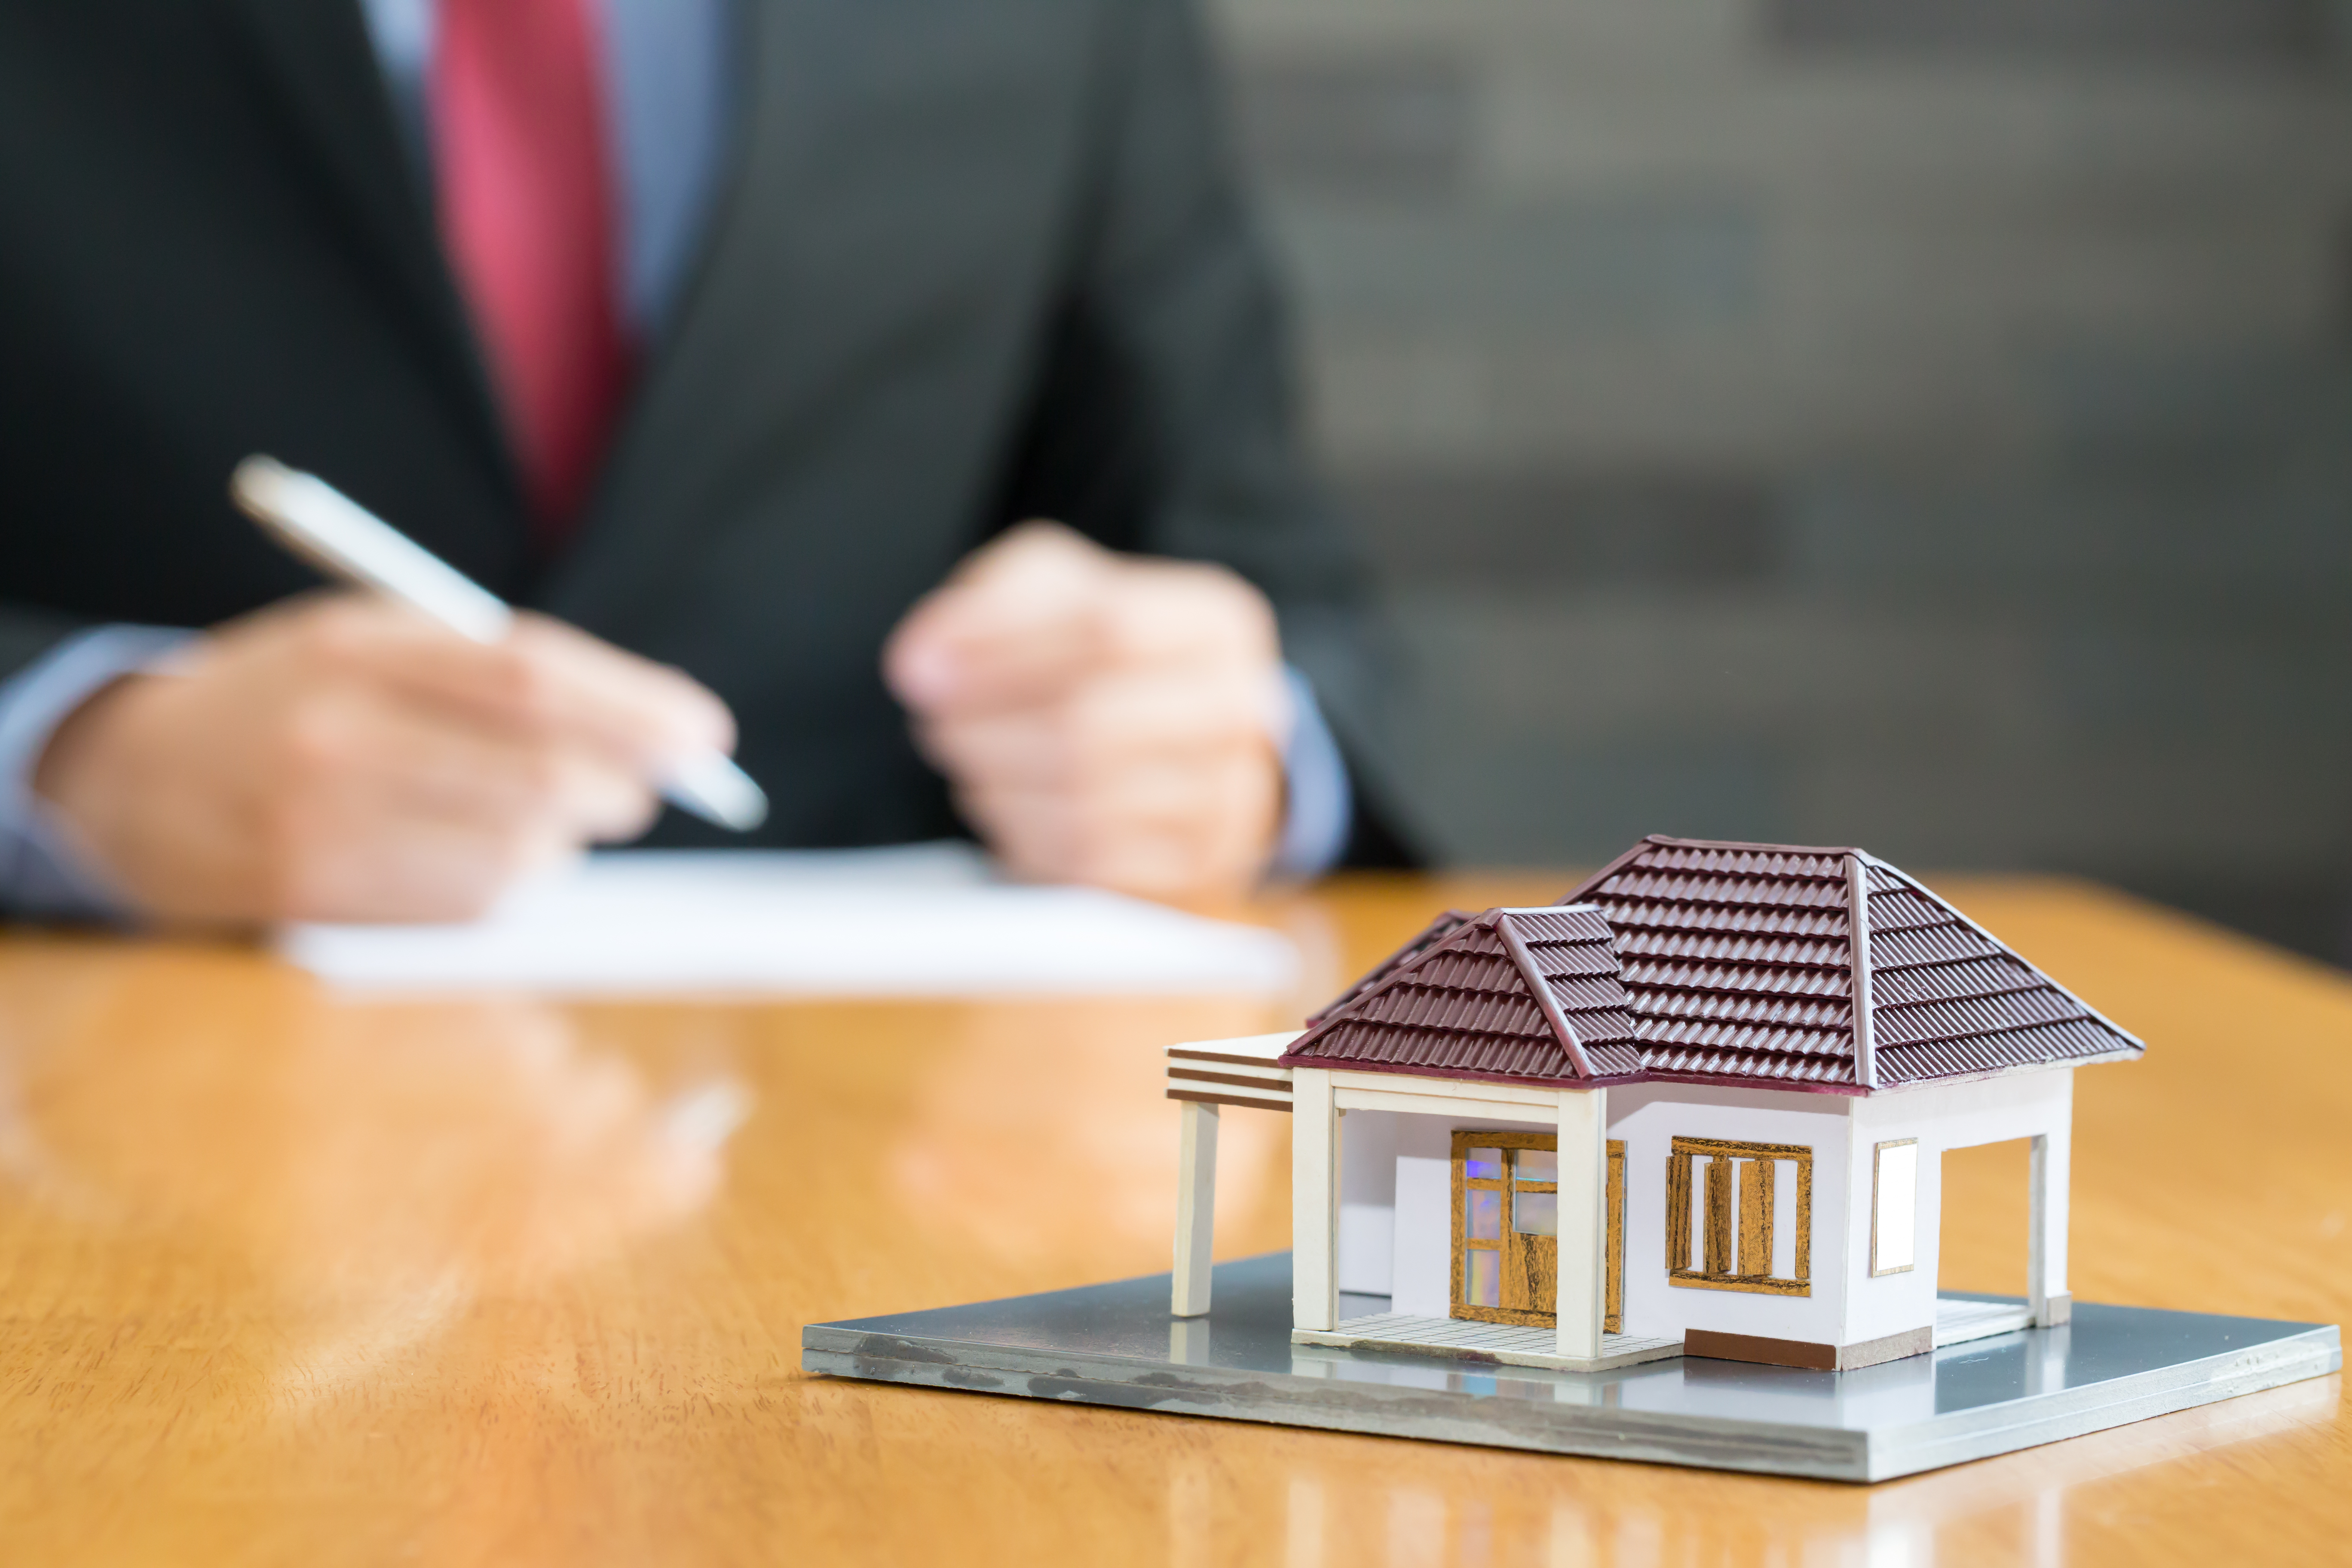 Prêt immobilier en 2017 : on y gagne encore